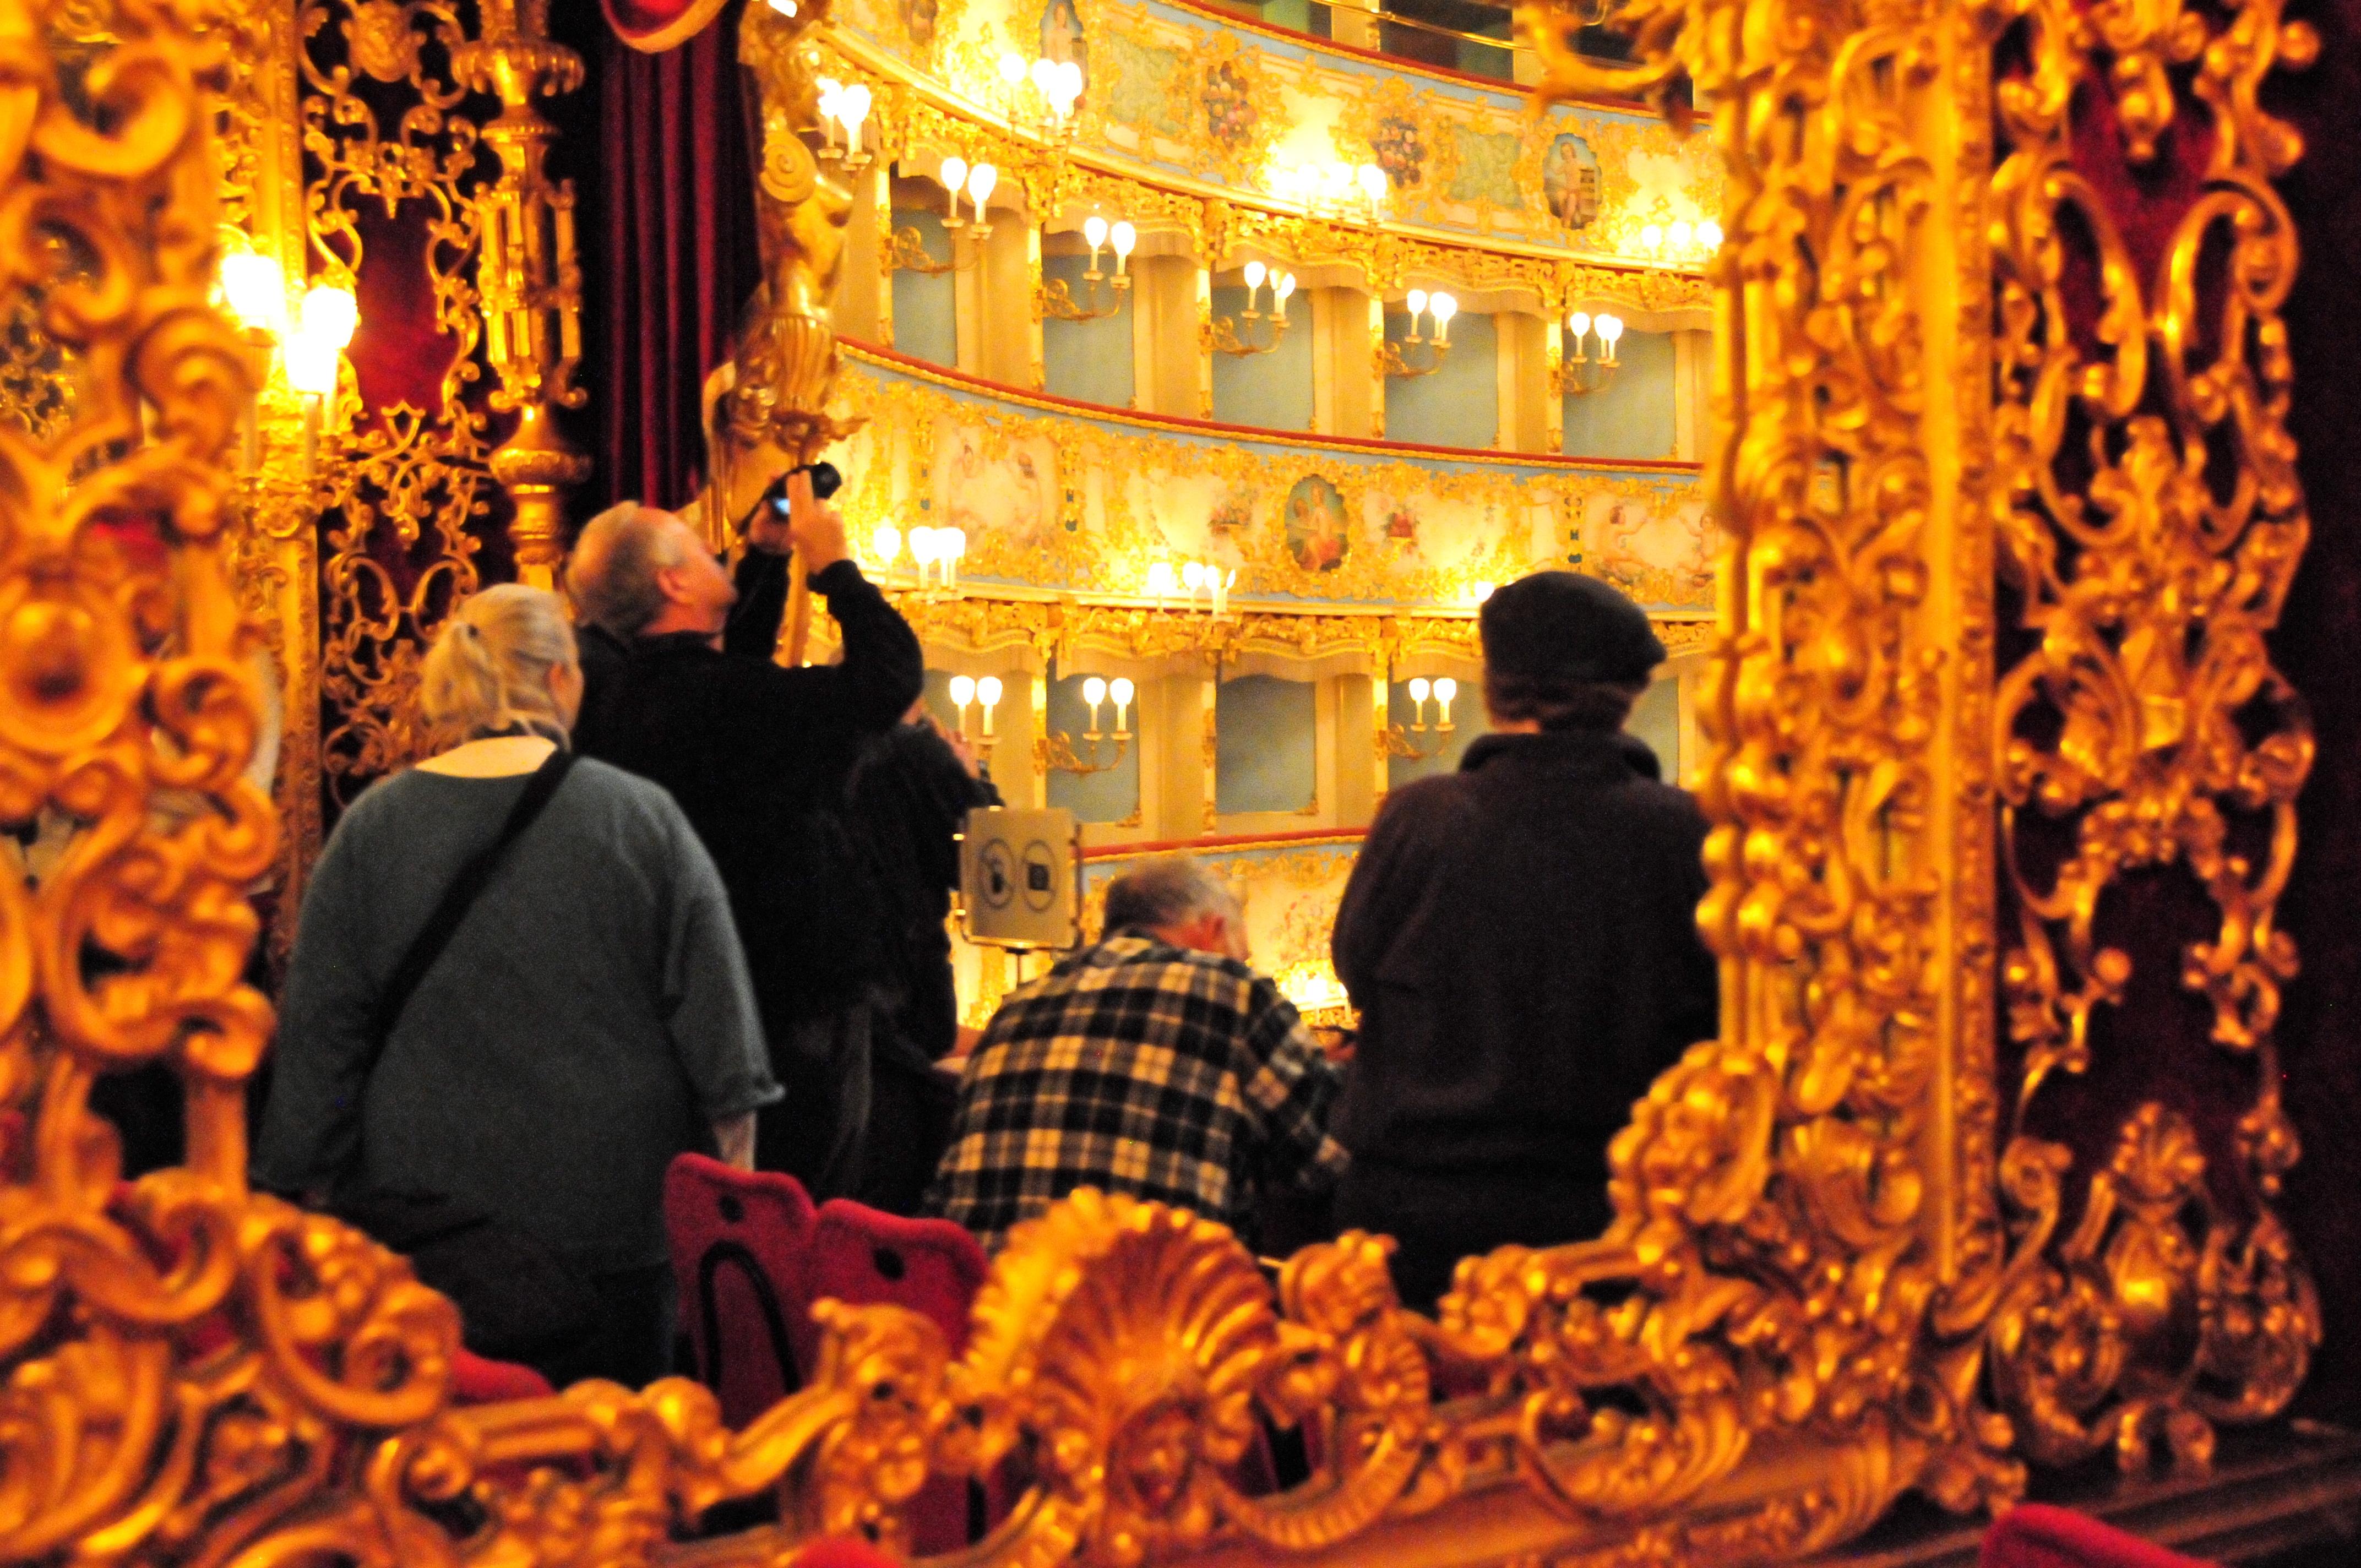 7-ornate-mirror_fenice-frank-van-riper